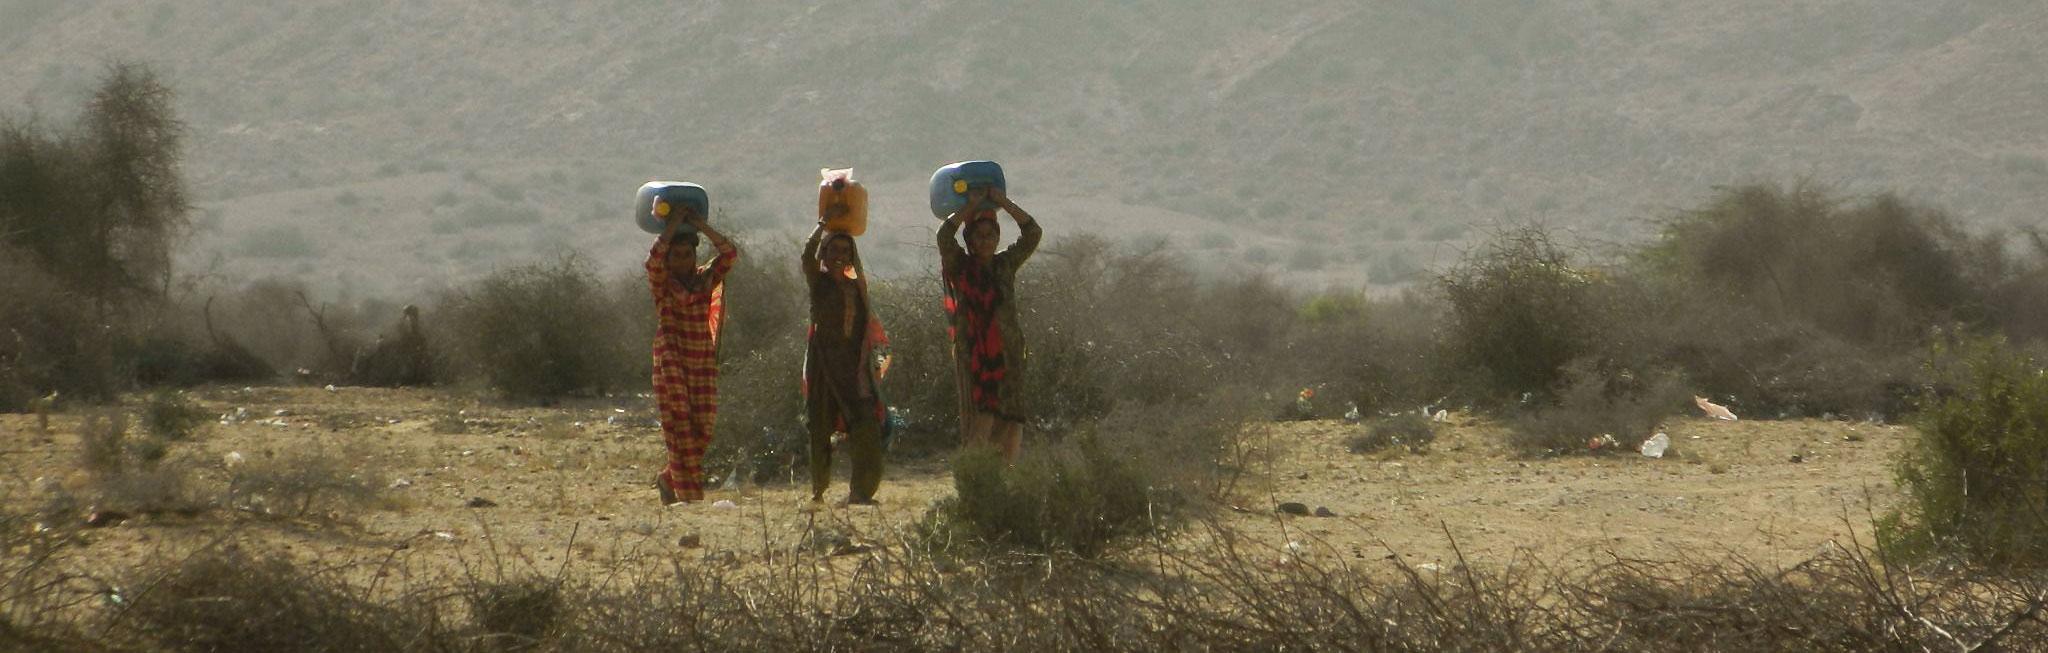 Water-for-Women-web